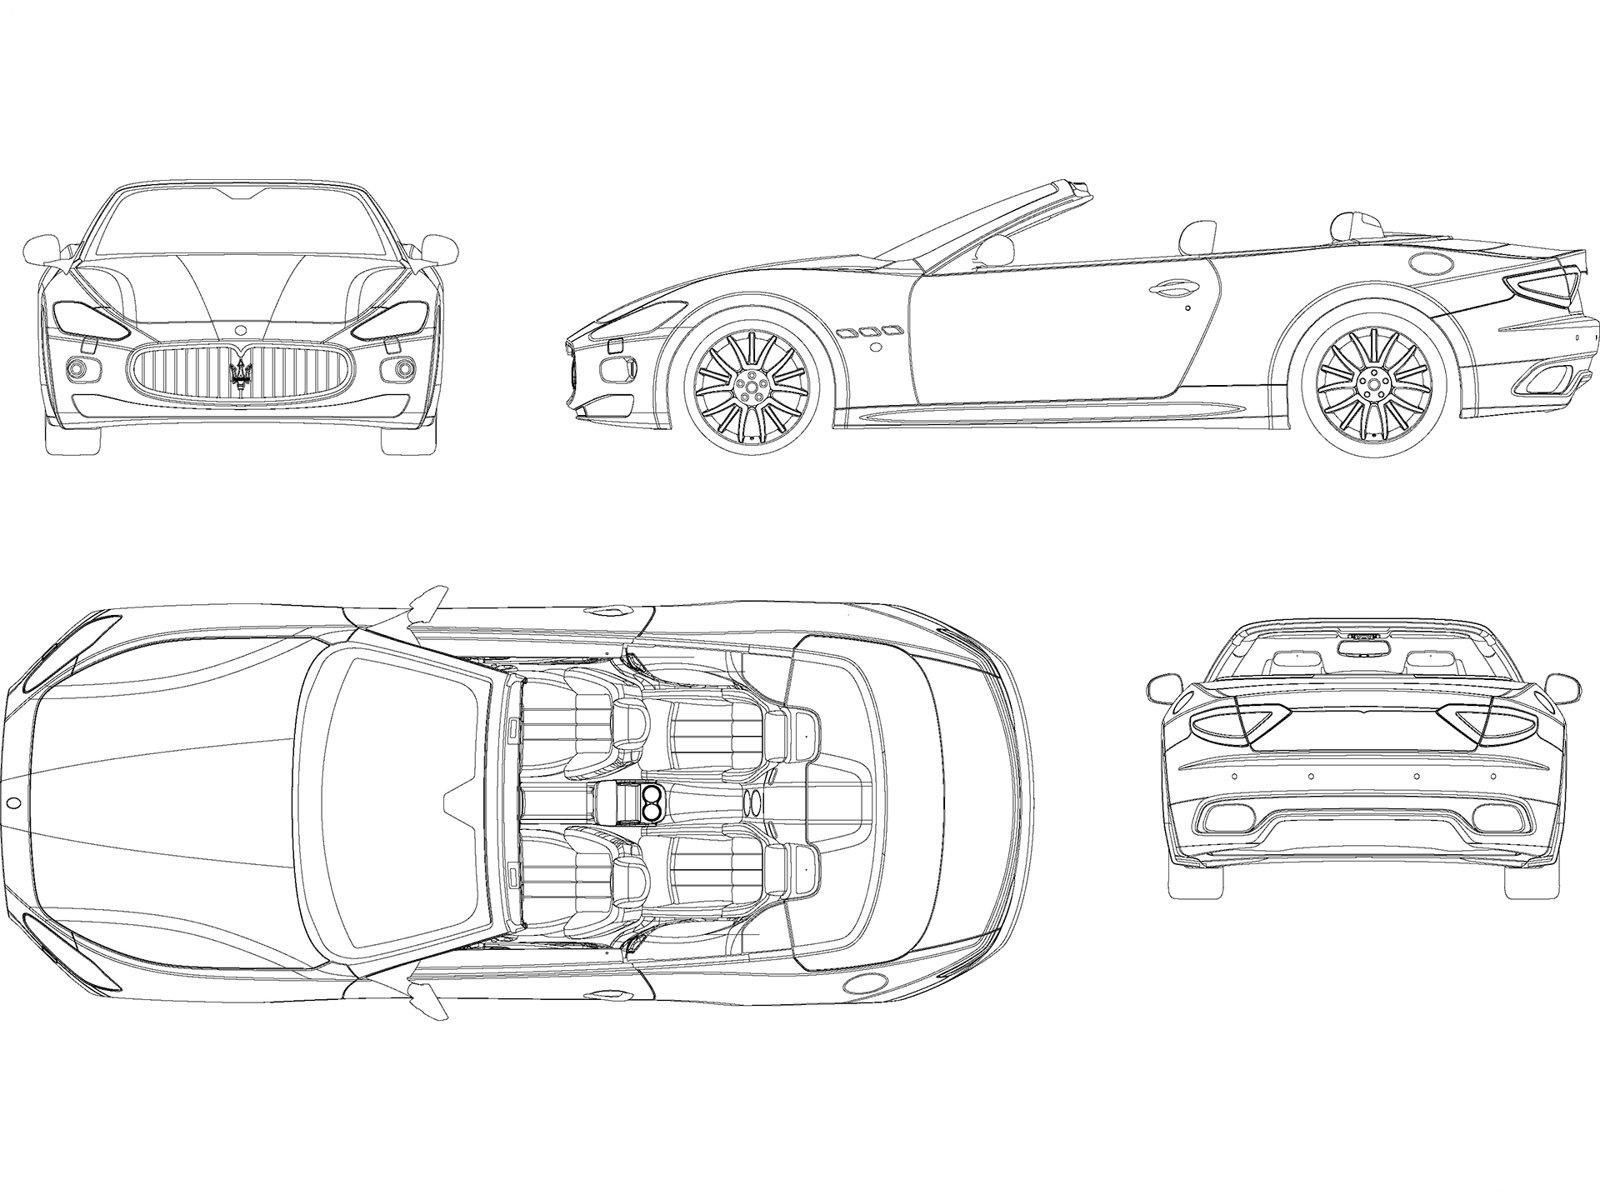 Car blueprints and free 3d models august 2011 for Free 3d blueprints